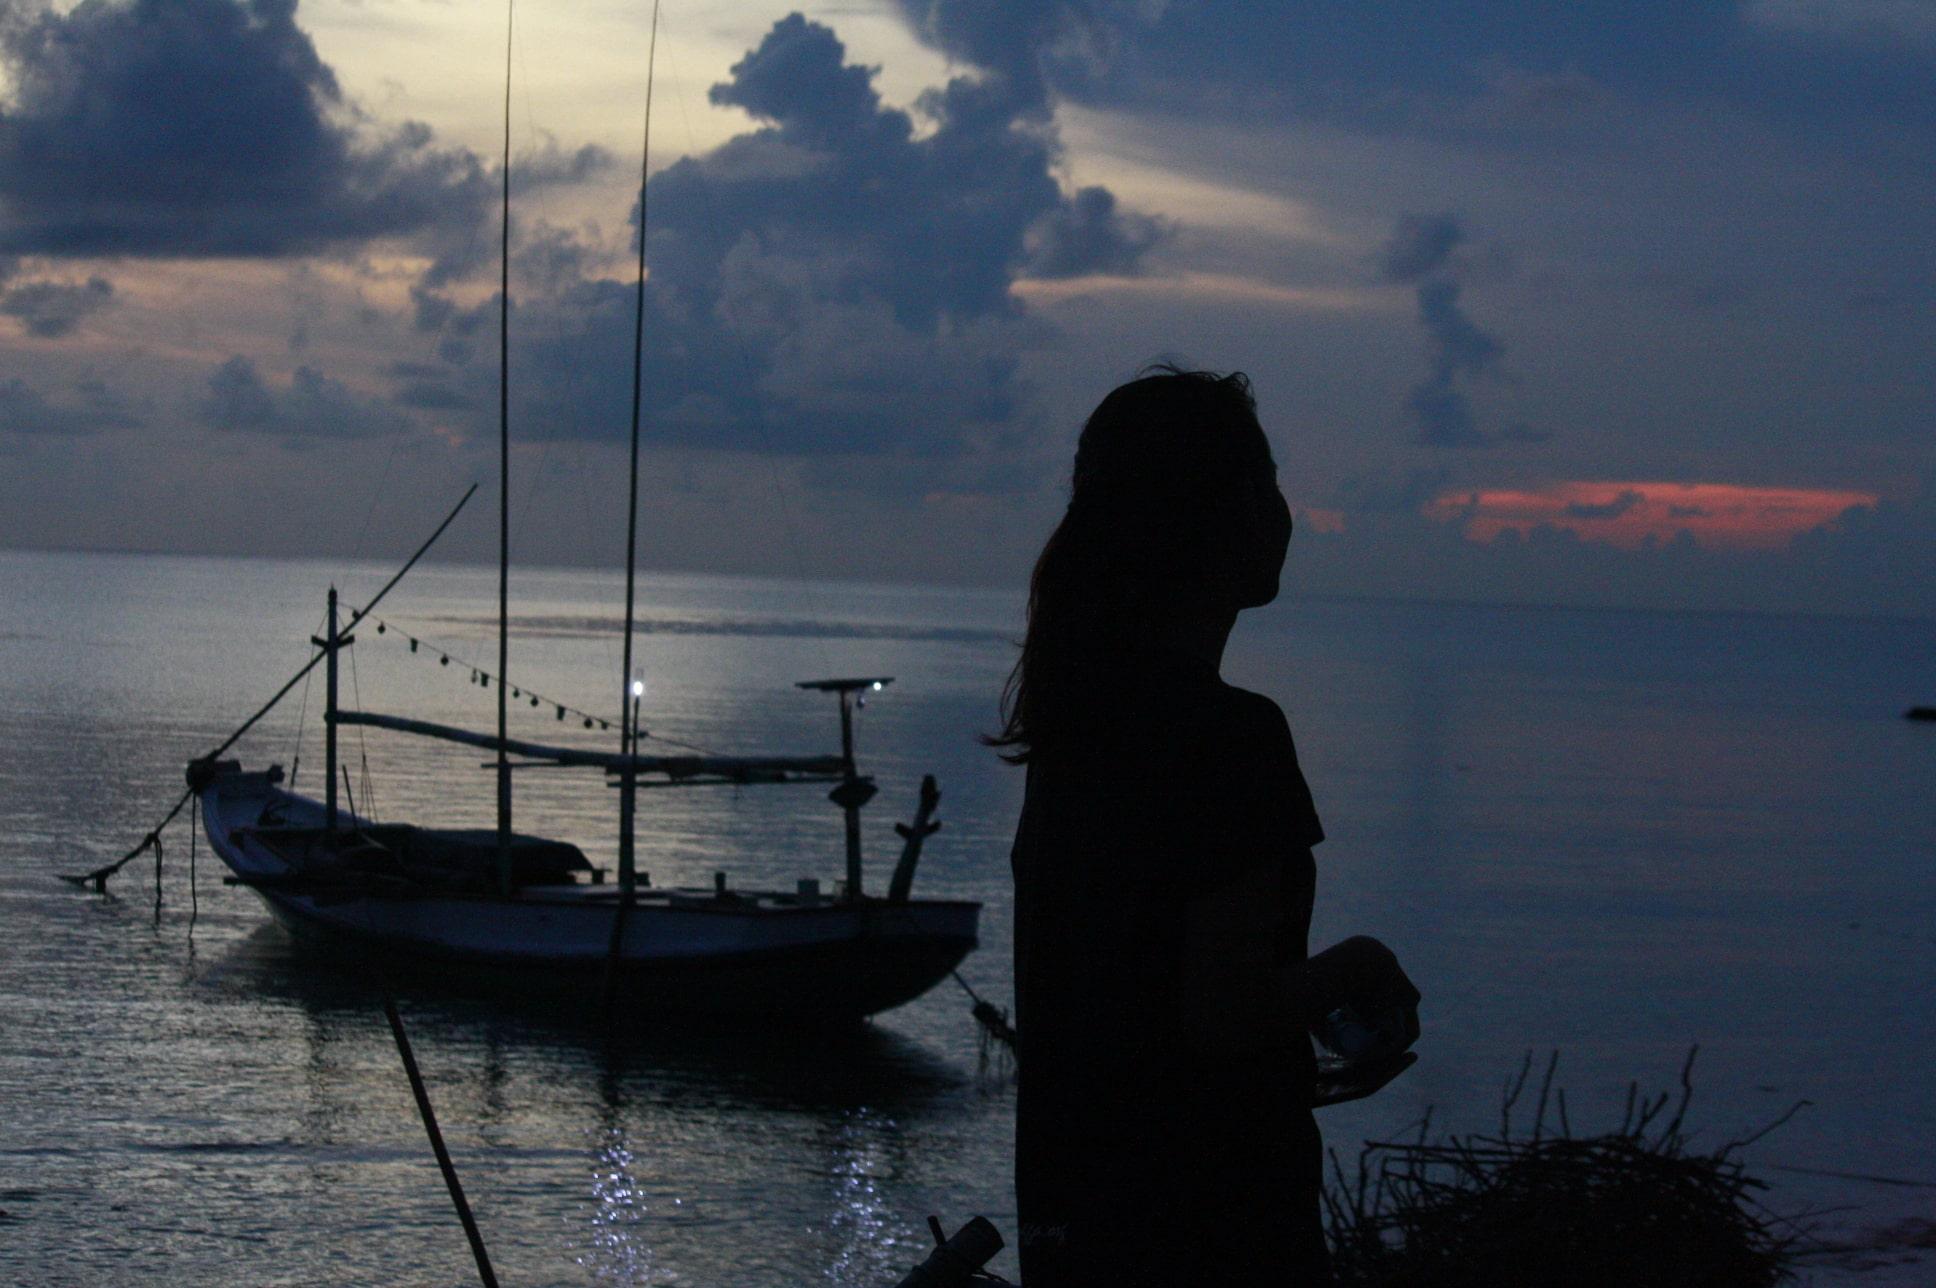 Menikmati sunset pantai di Masalembu | Foto: Fariz Ilham Rosyidi